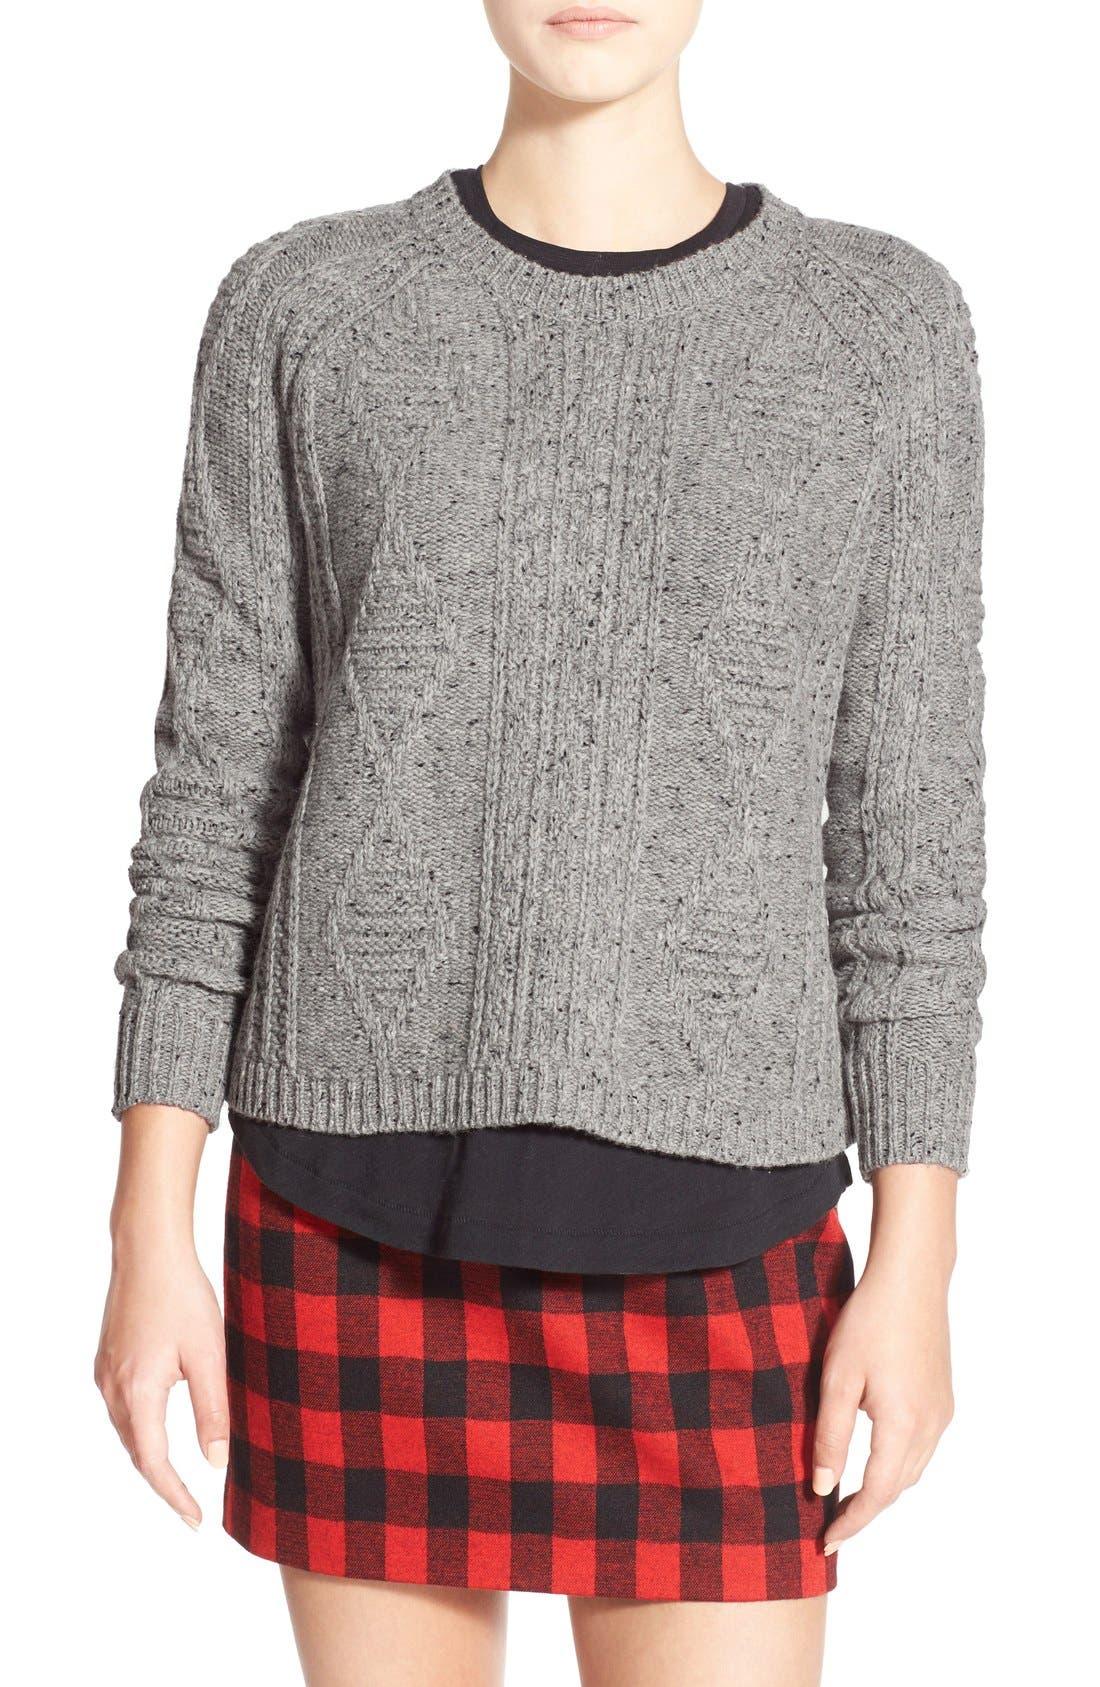 MADEWELL,                             'Palisade' Back Zip Sweater,                             Main thumbnail 1, color,                             020